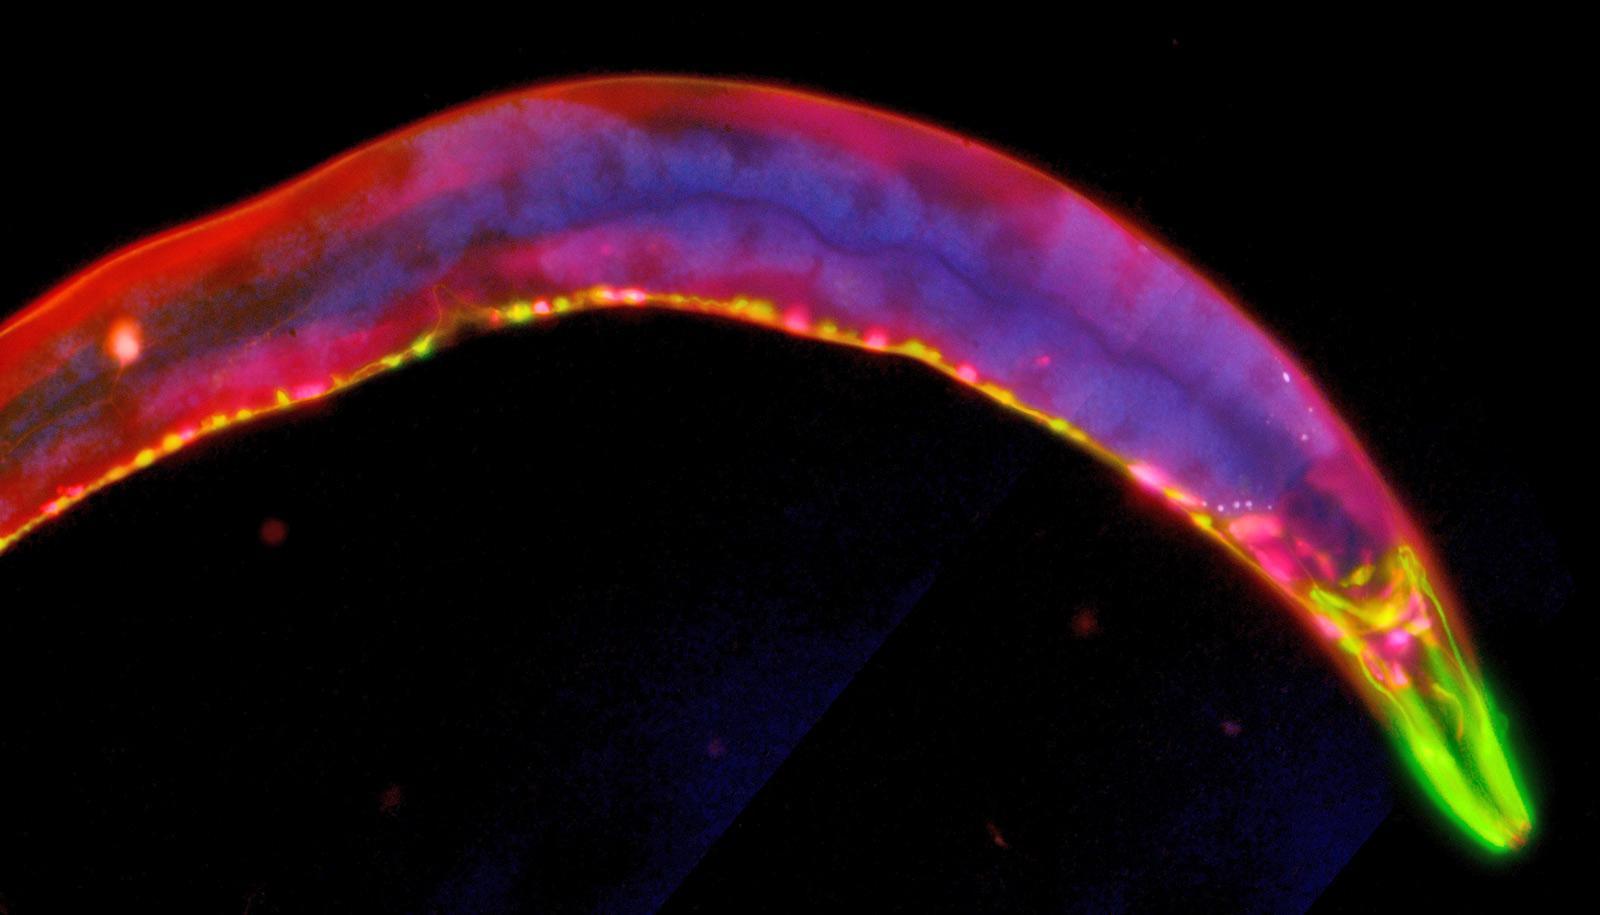 c. elegans worm on black